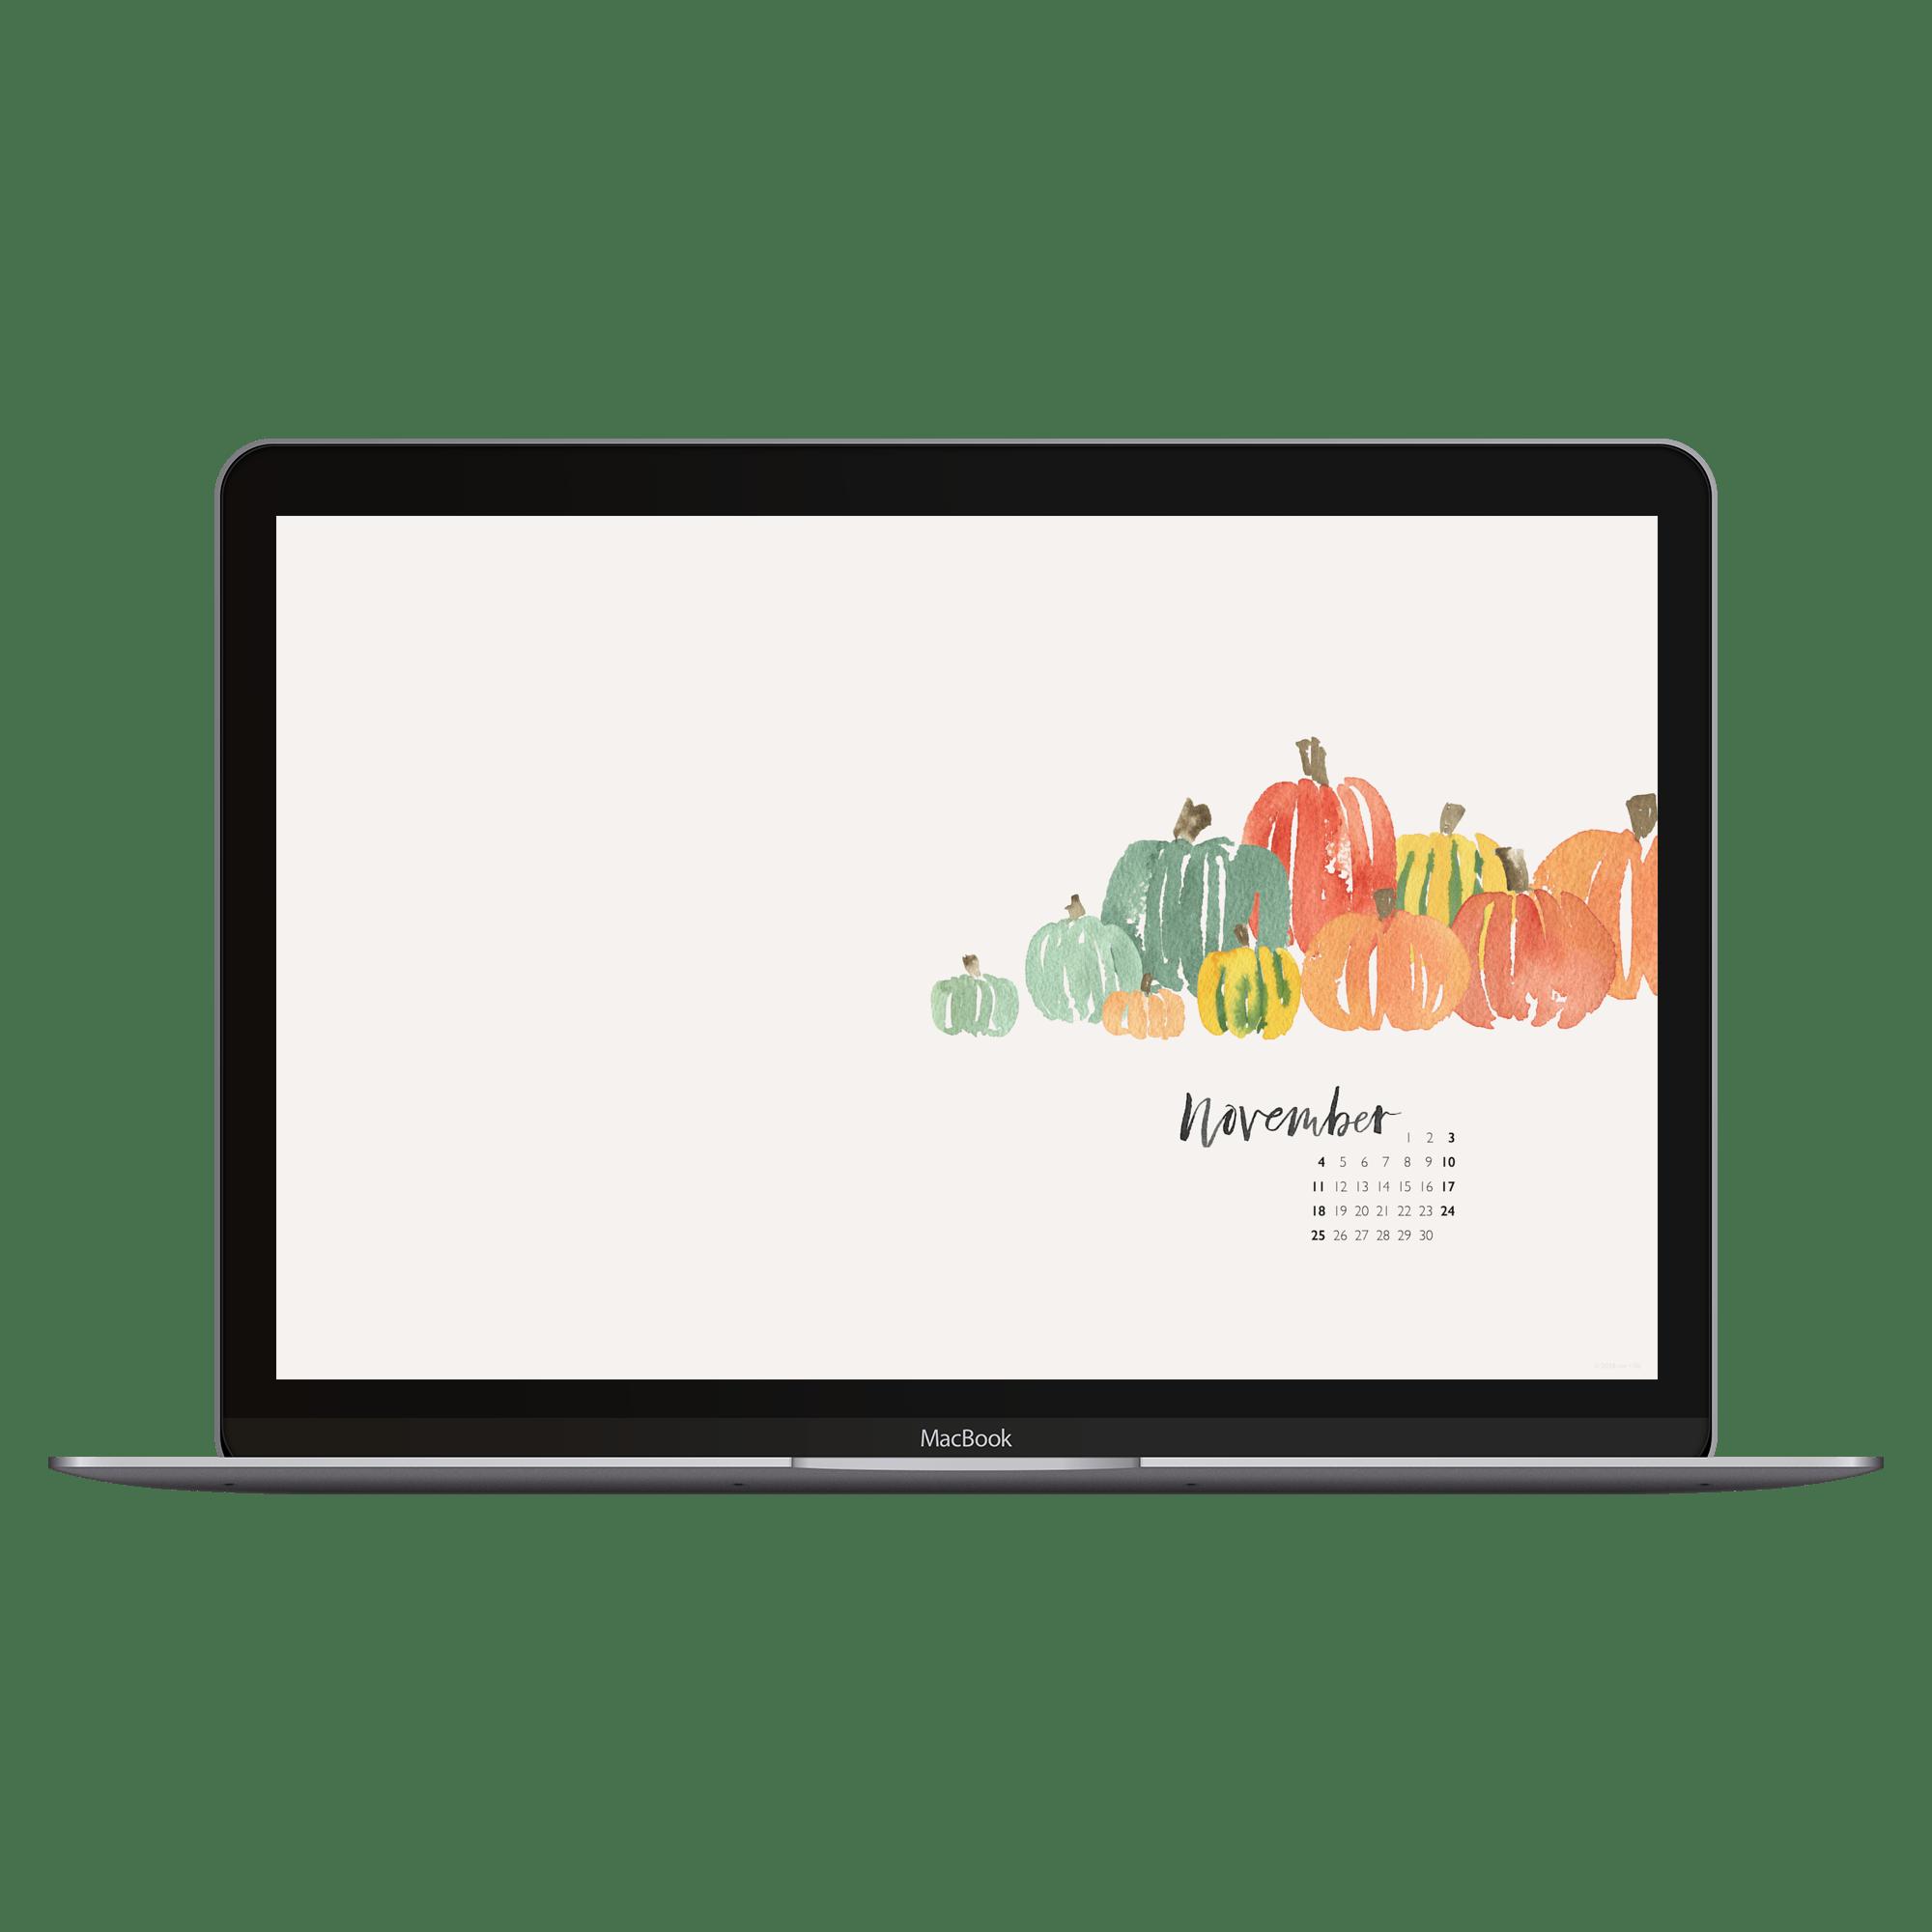 watercolor desktop calendar wallpaper